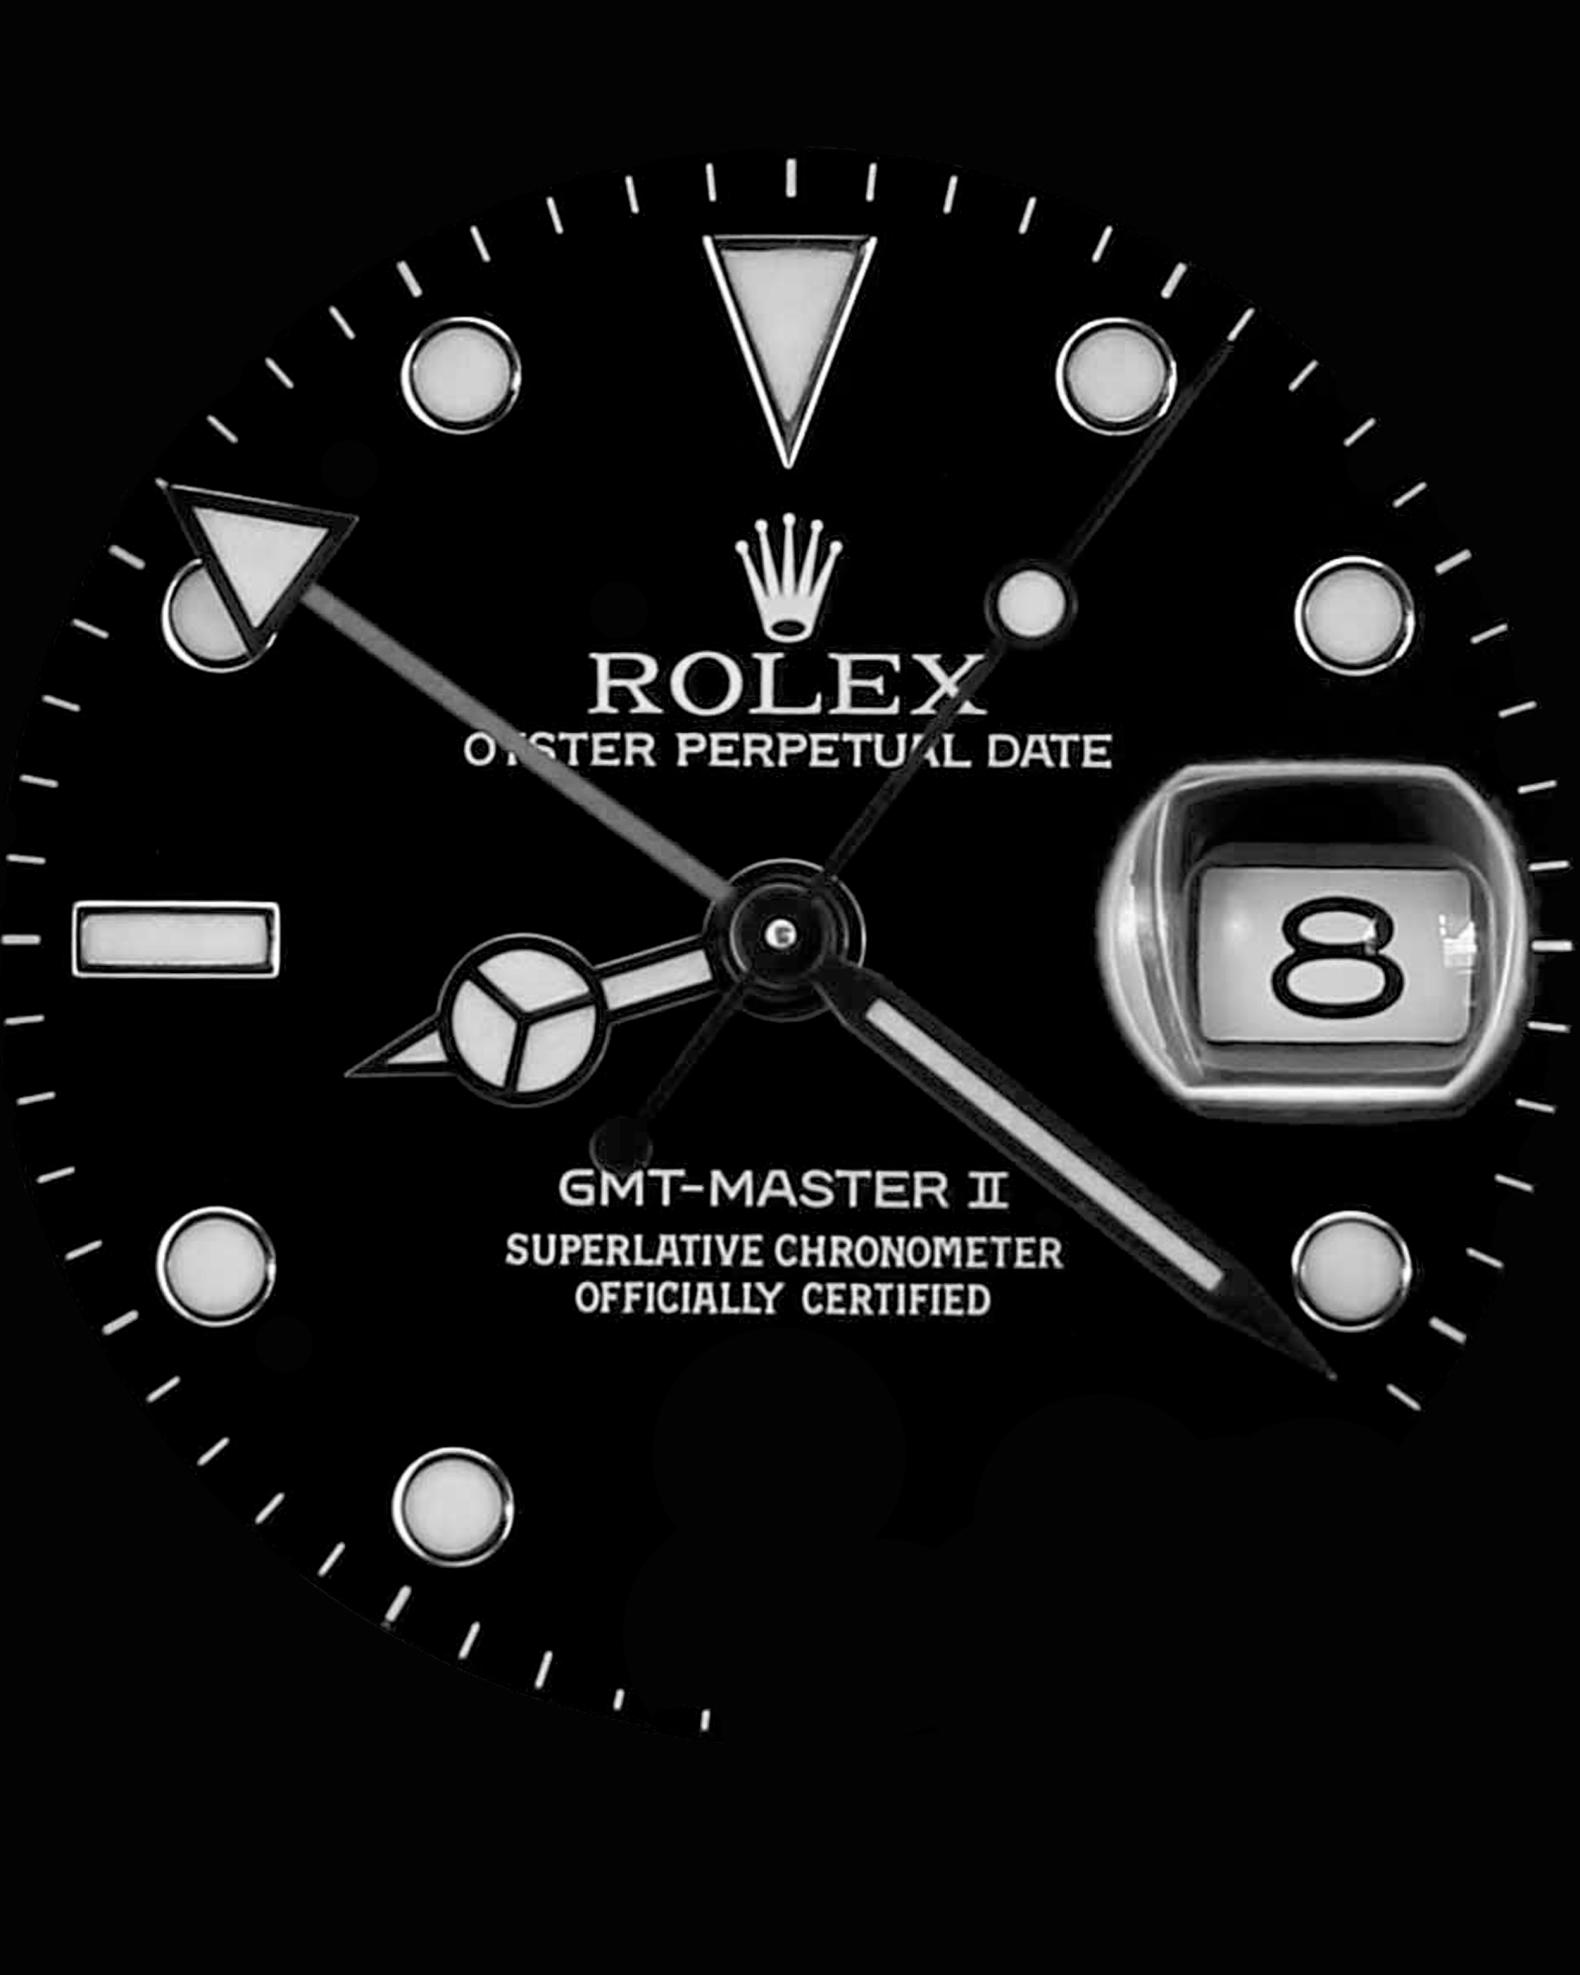 Rolex For Apple Watch Rolex 5016 Watch Wallpaper Apple Watch Reloj Apple Apple Watch Series 3